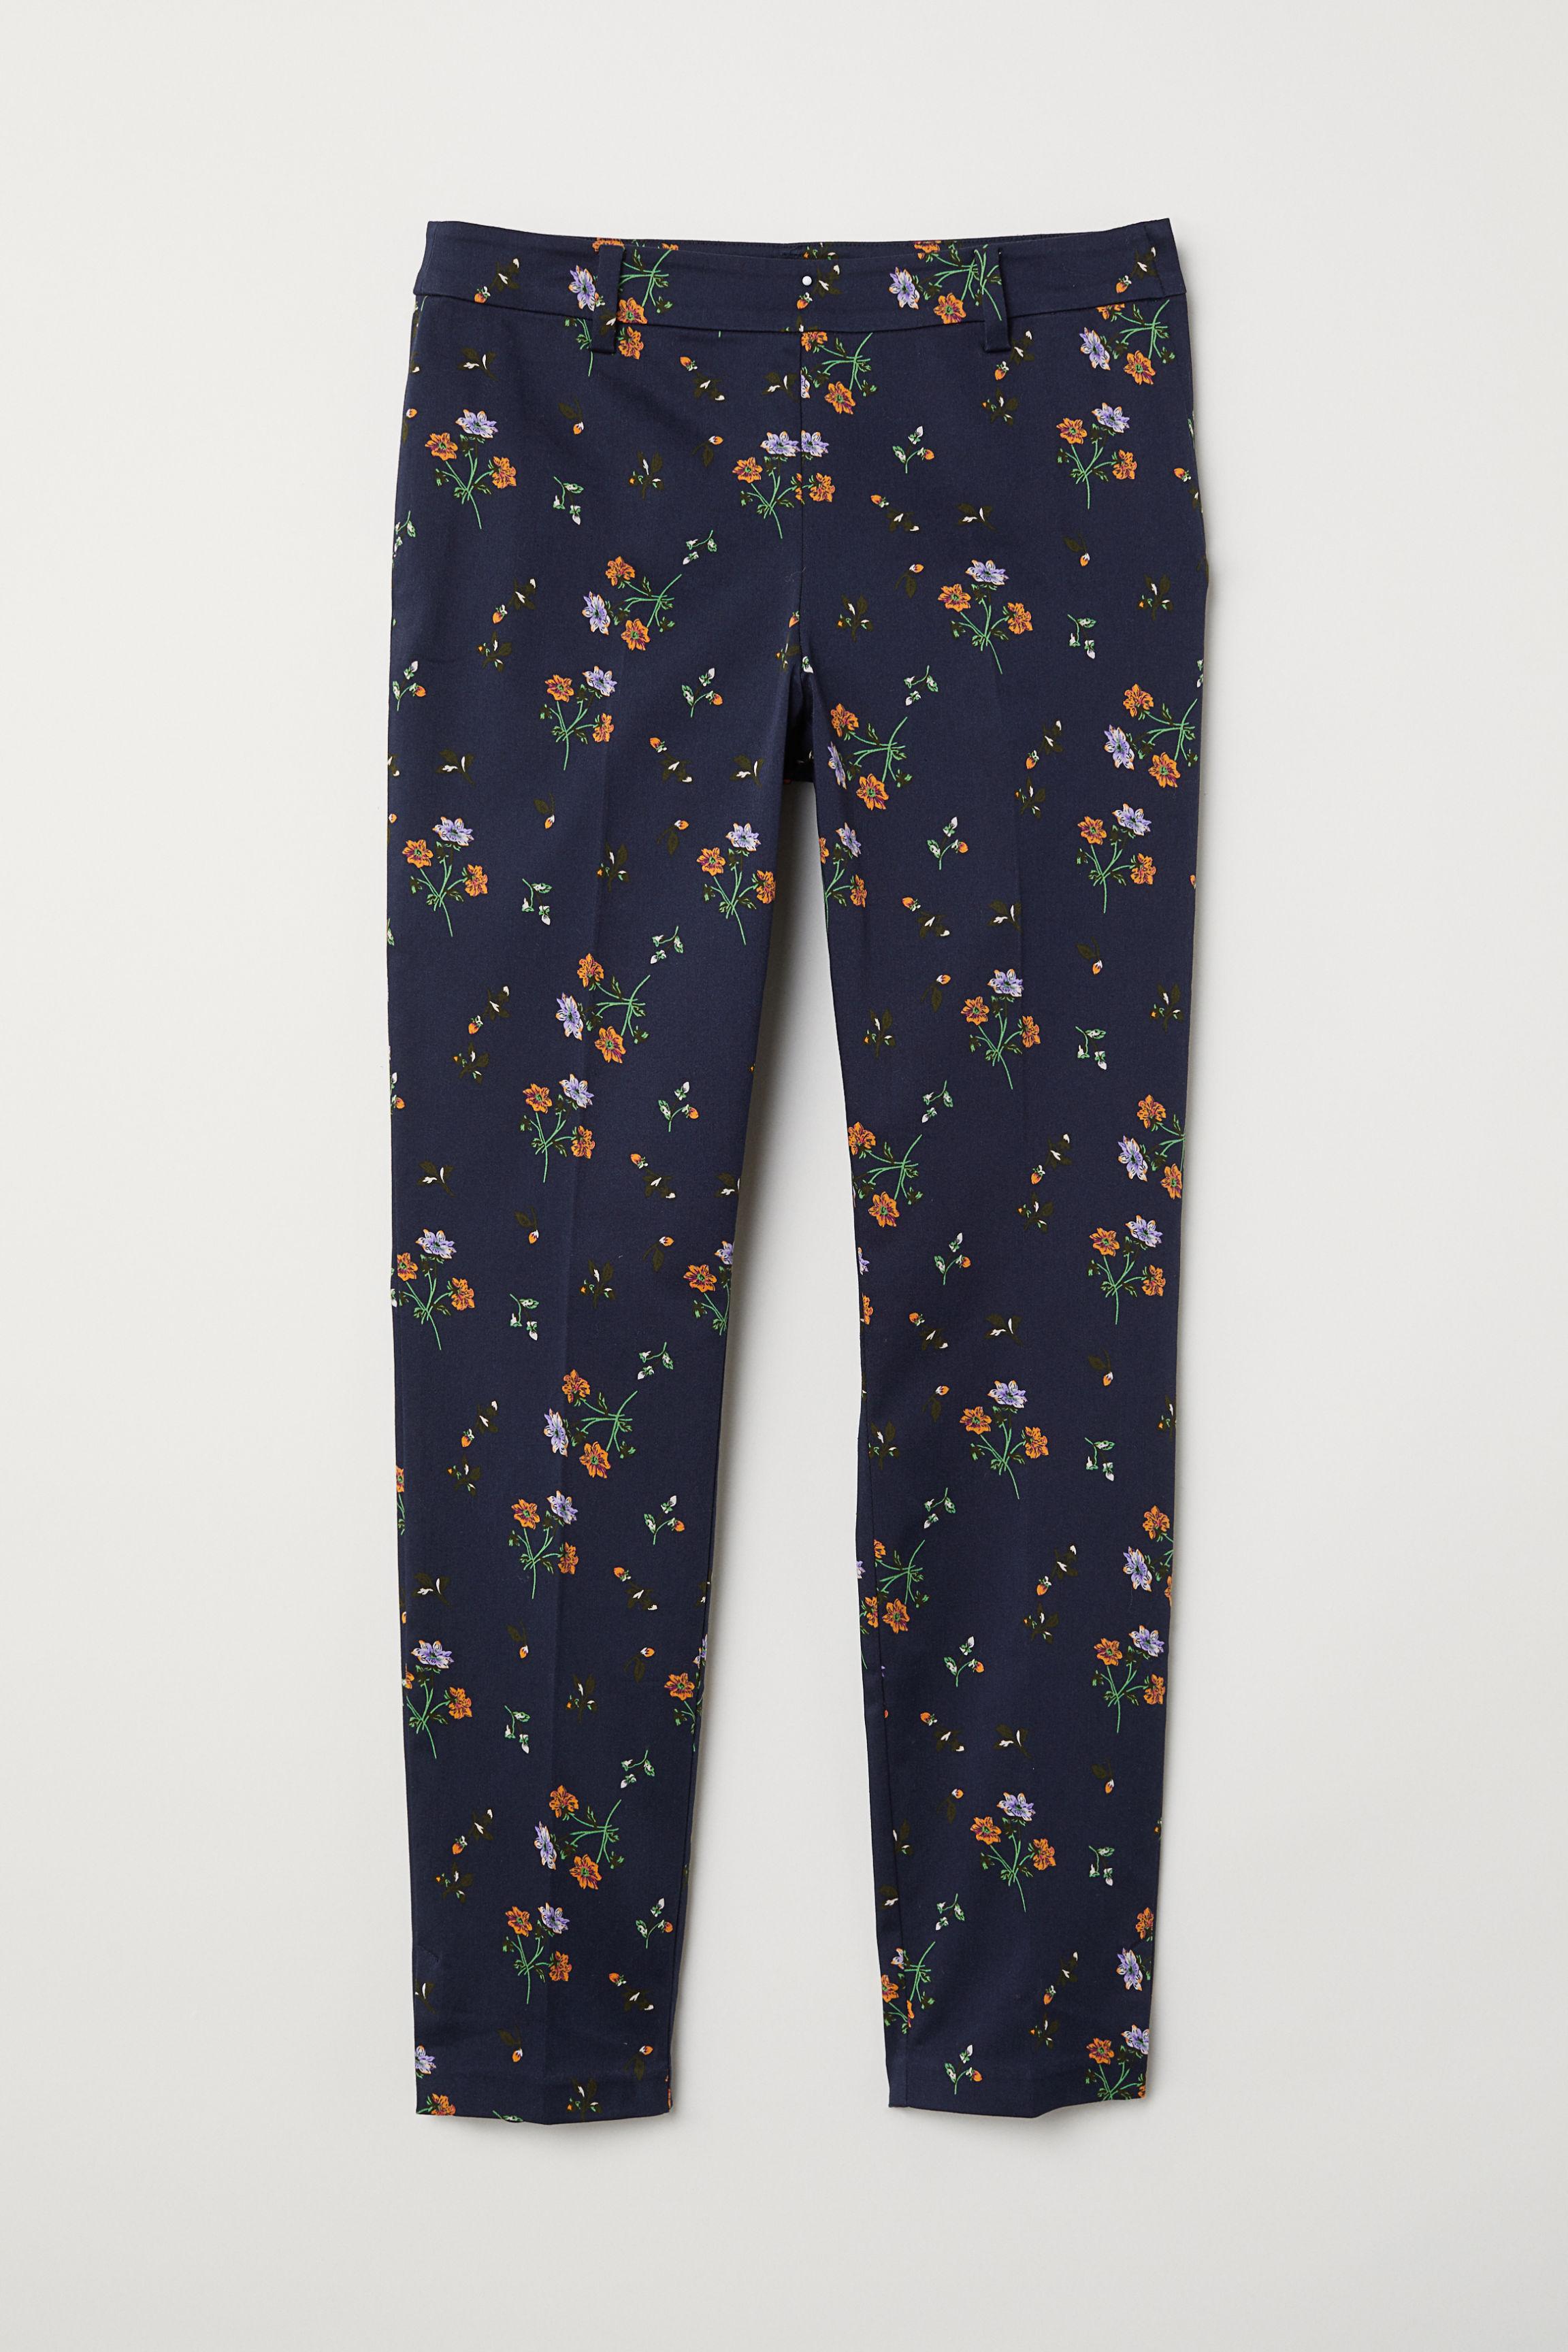 a05f19285f Blue Patterned Dress Pants – DACC